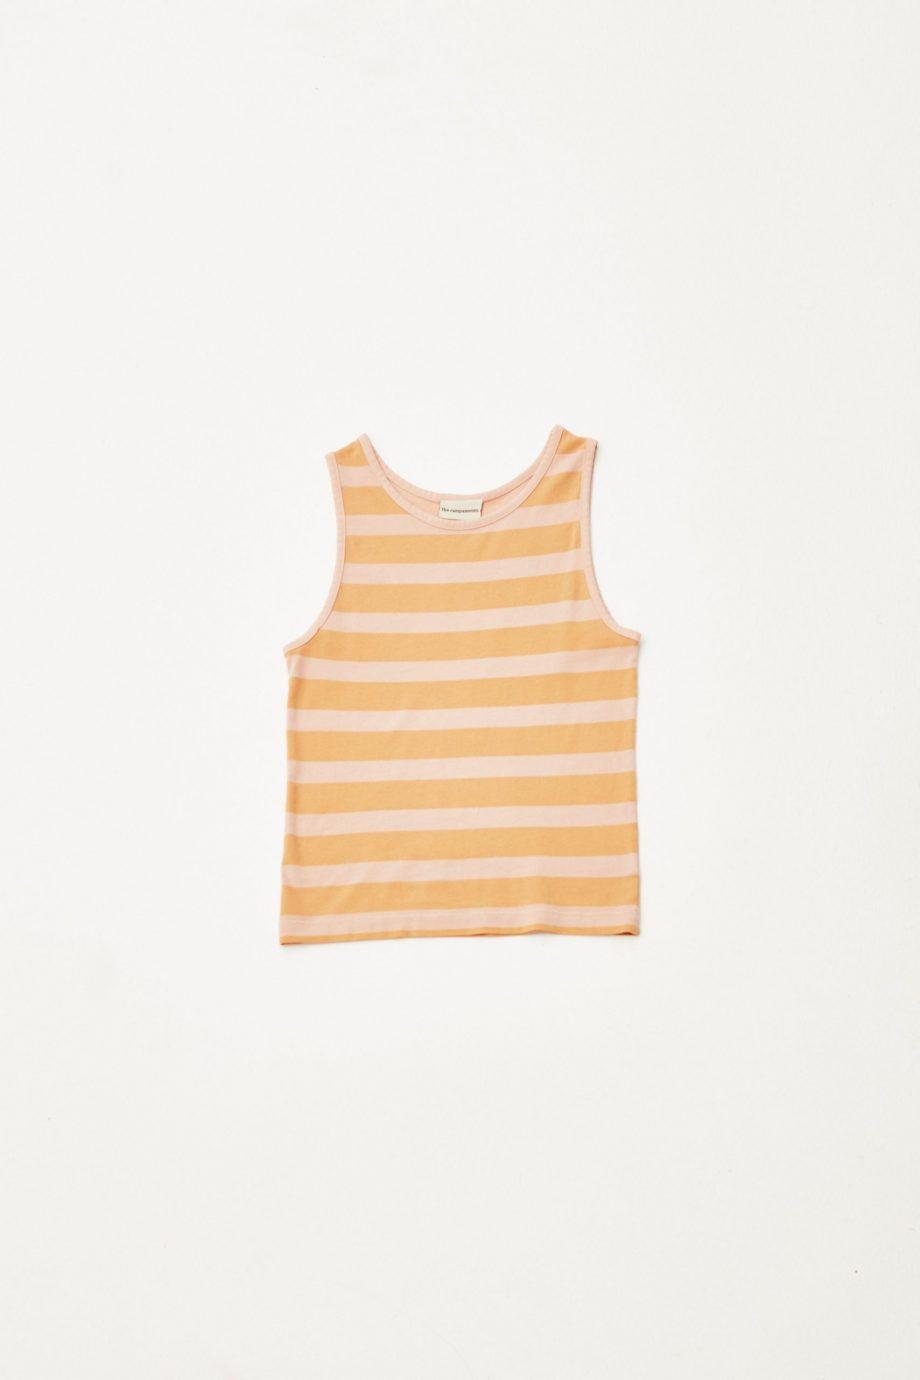 Stripped Sleveless Tshirt